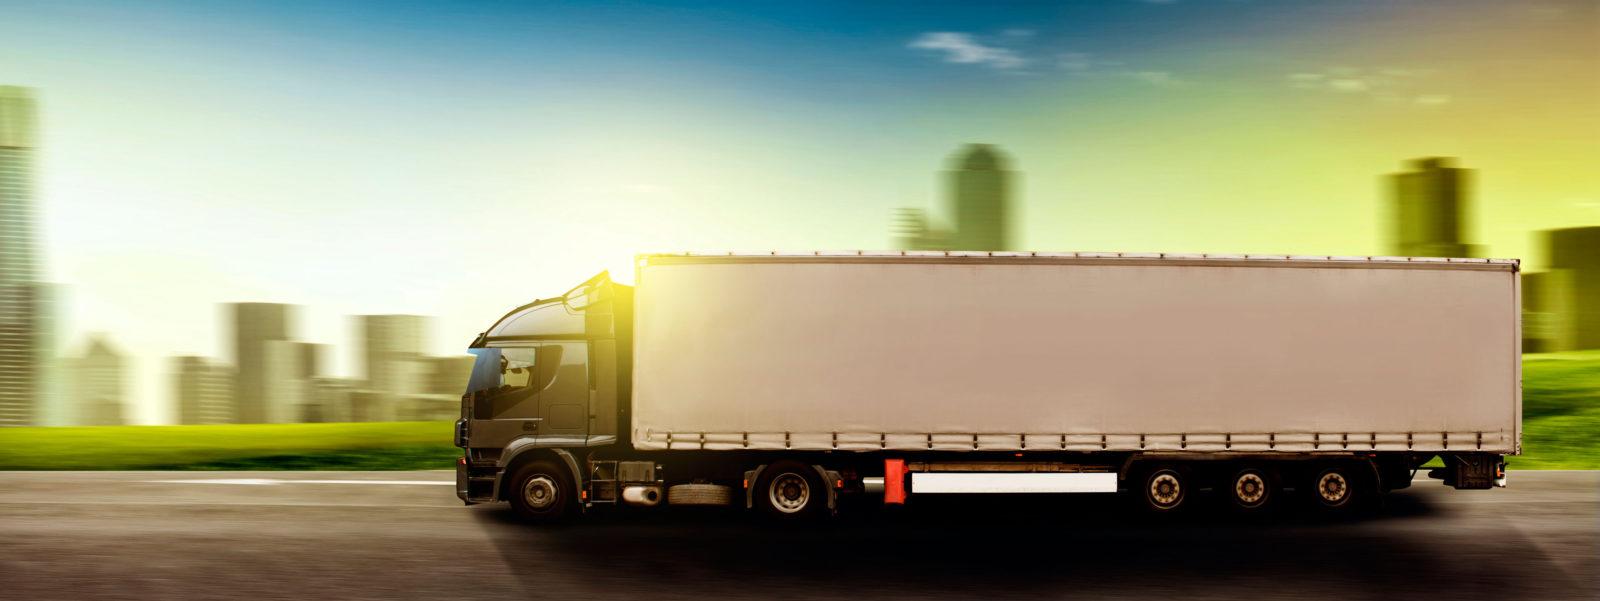 До конца года транспортные перевозки подорожают на 10–15%